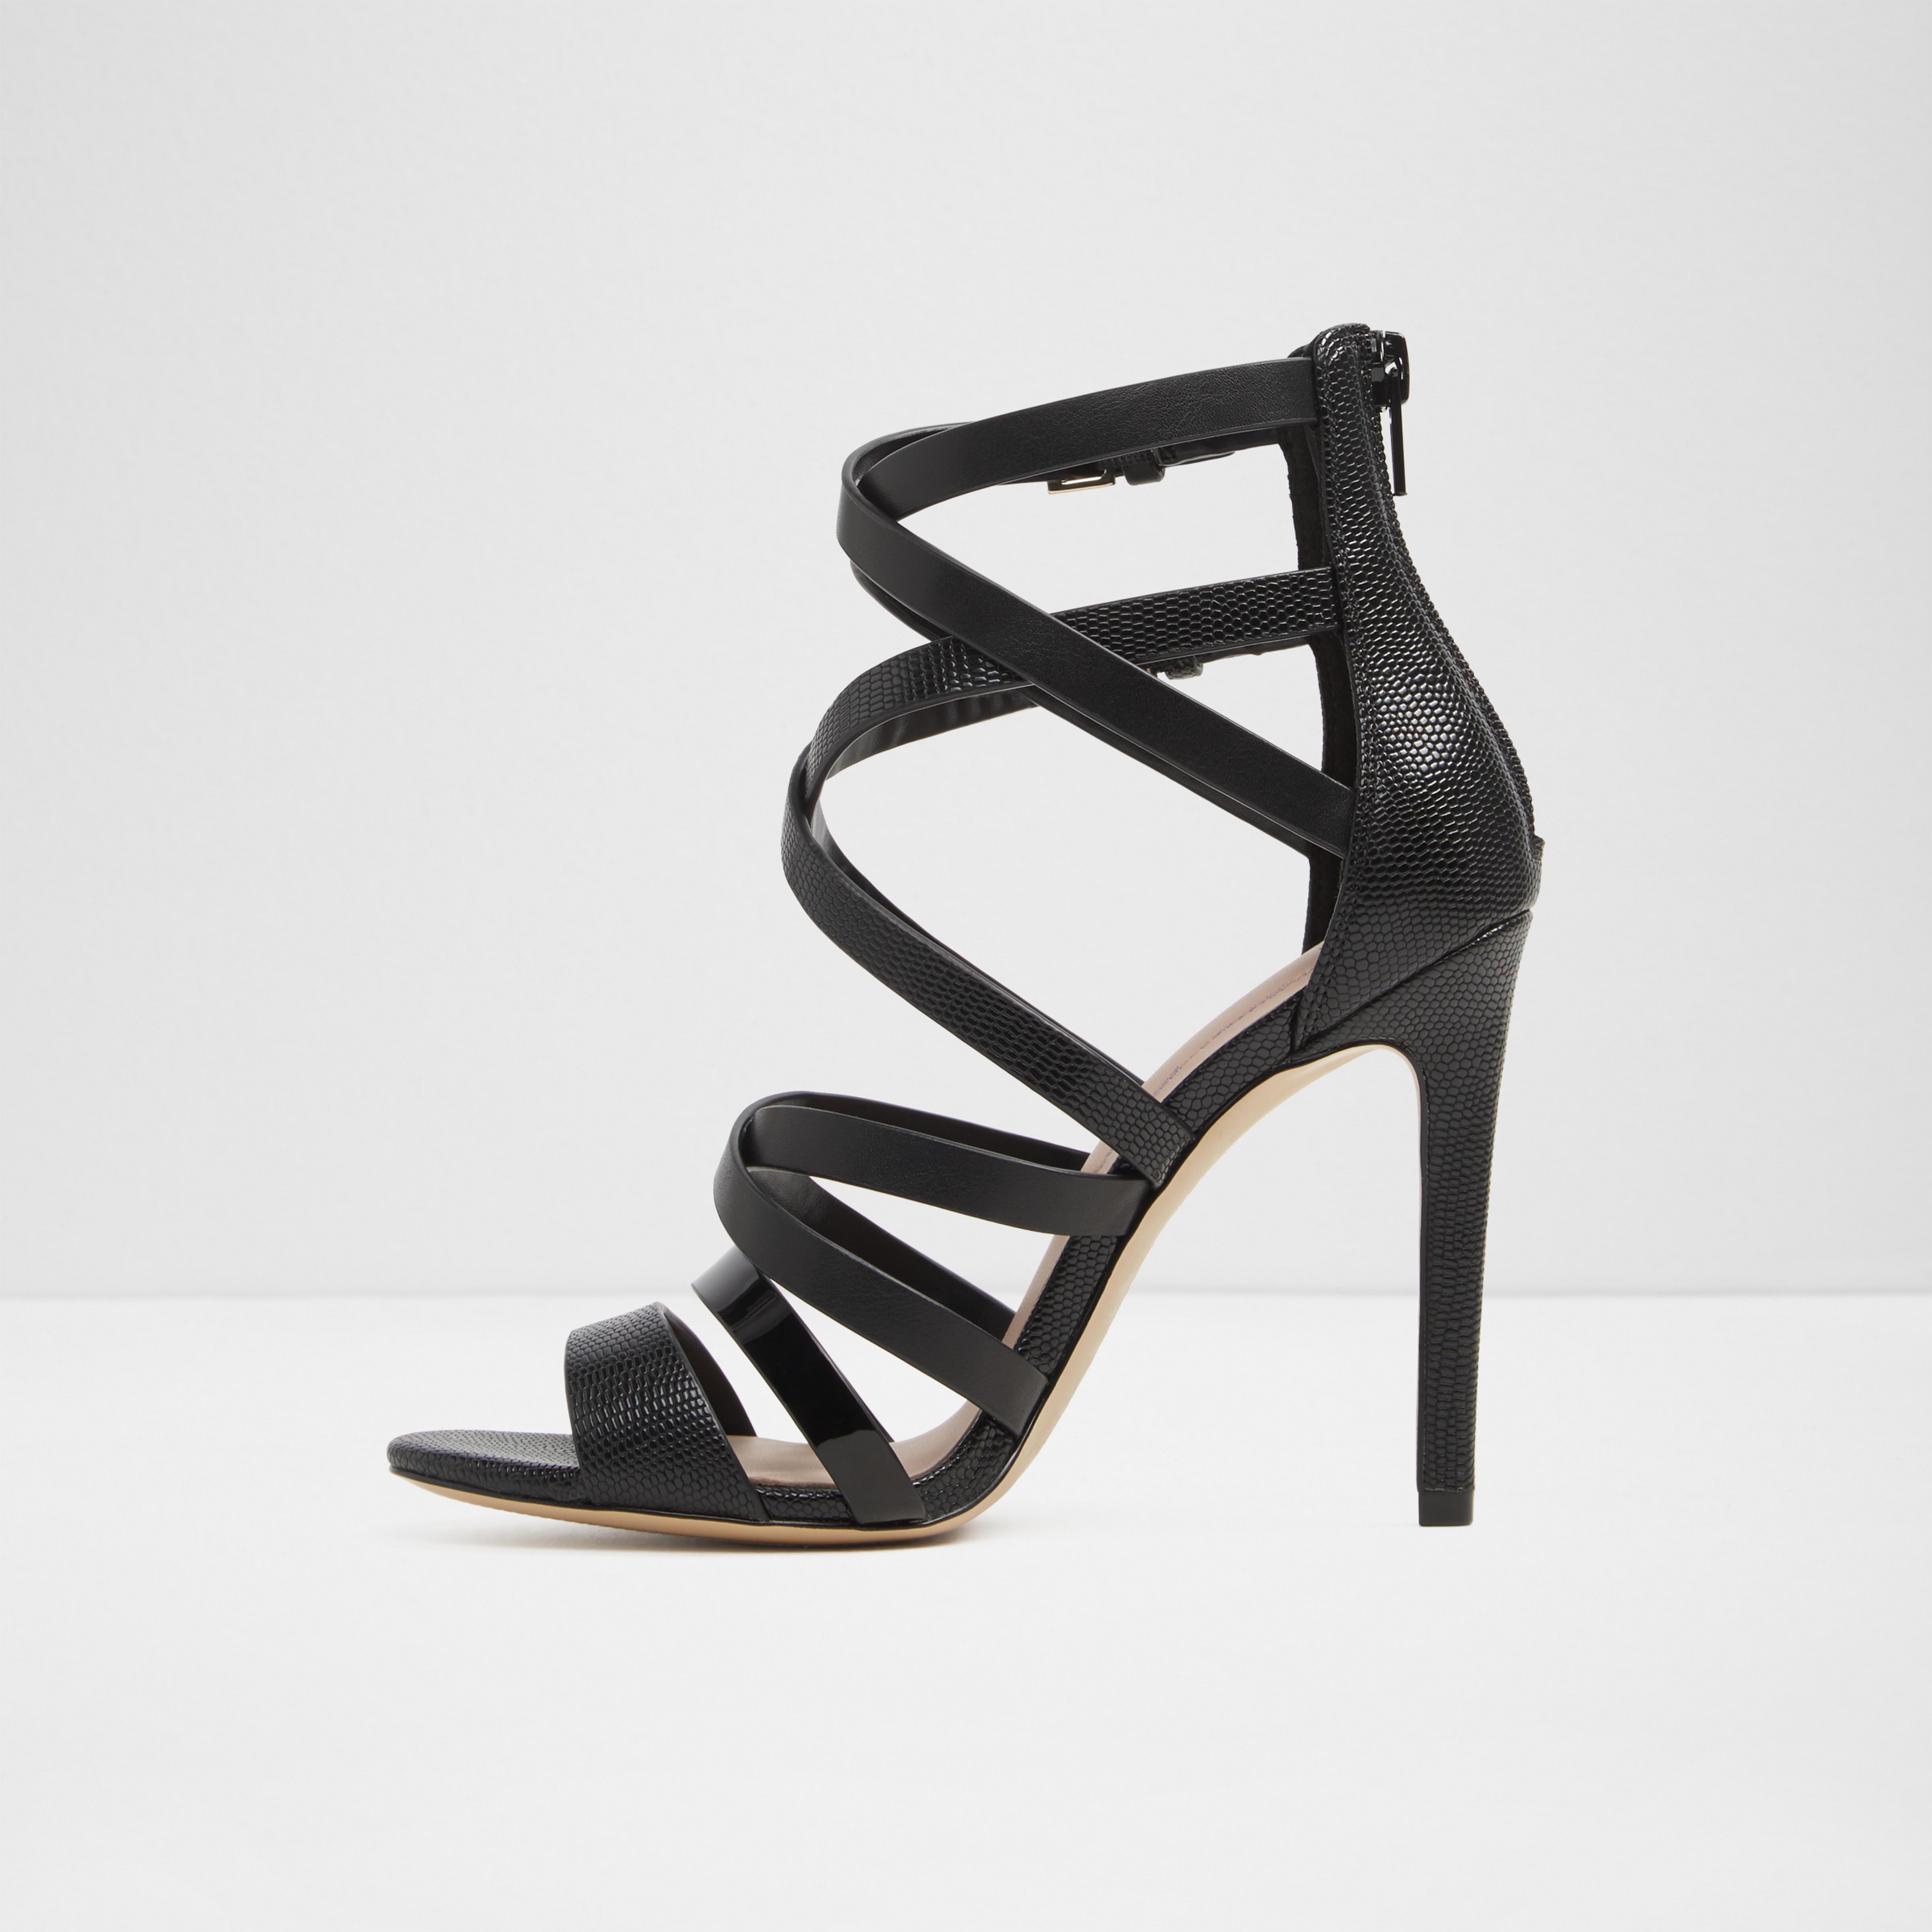 ALDOVALECIA - High heeled sandals - medium brown 6l1aB4eoNq